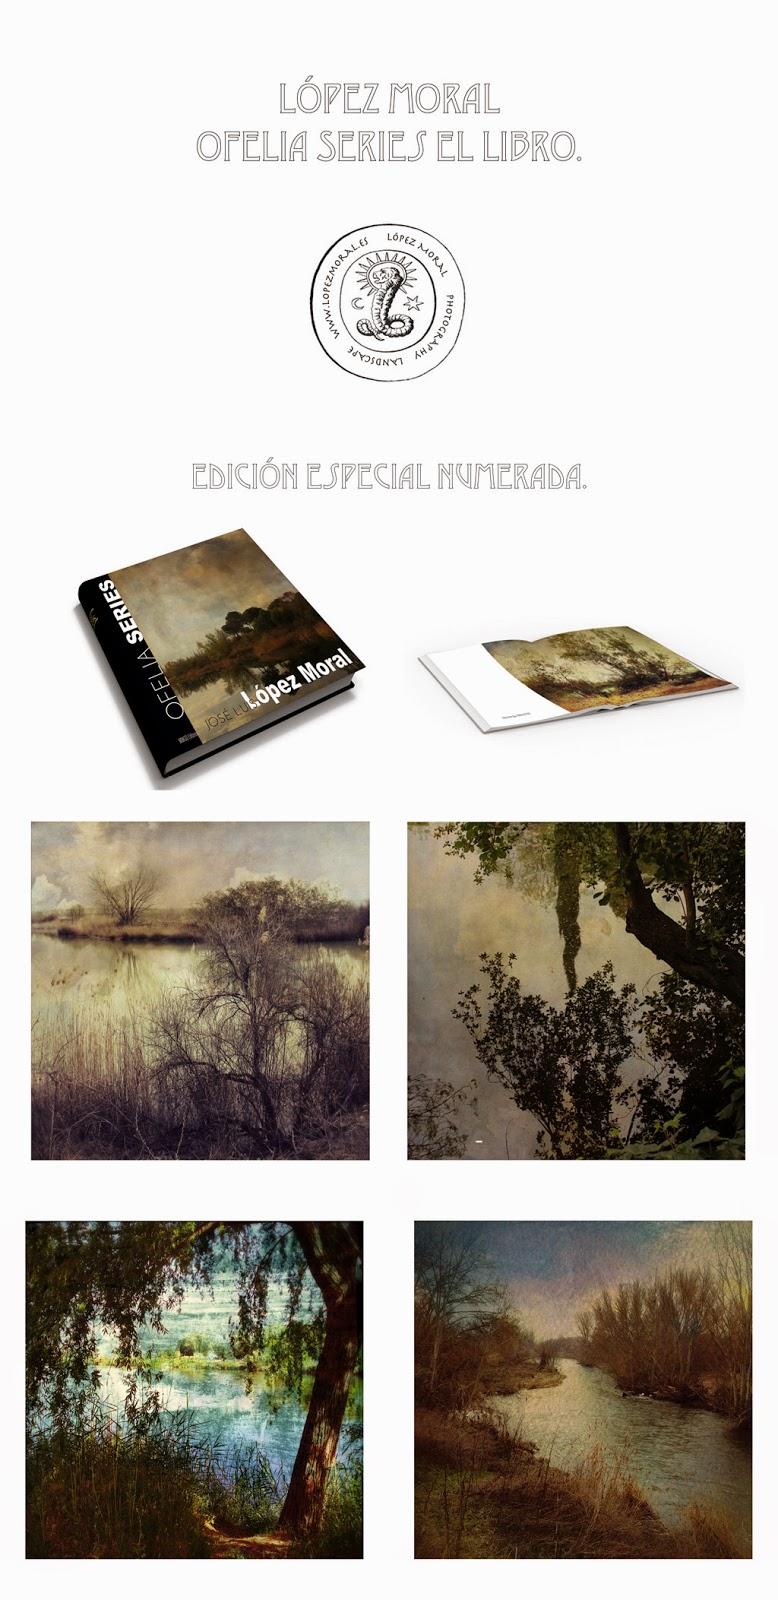 phto book,art Photo, ofelia, edicion limitada, Lopez Moral, Ophelia, fotolibro, ventas de fotografia